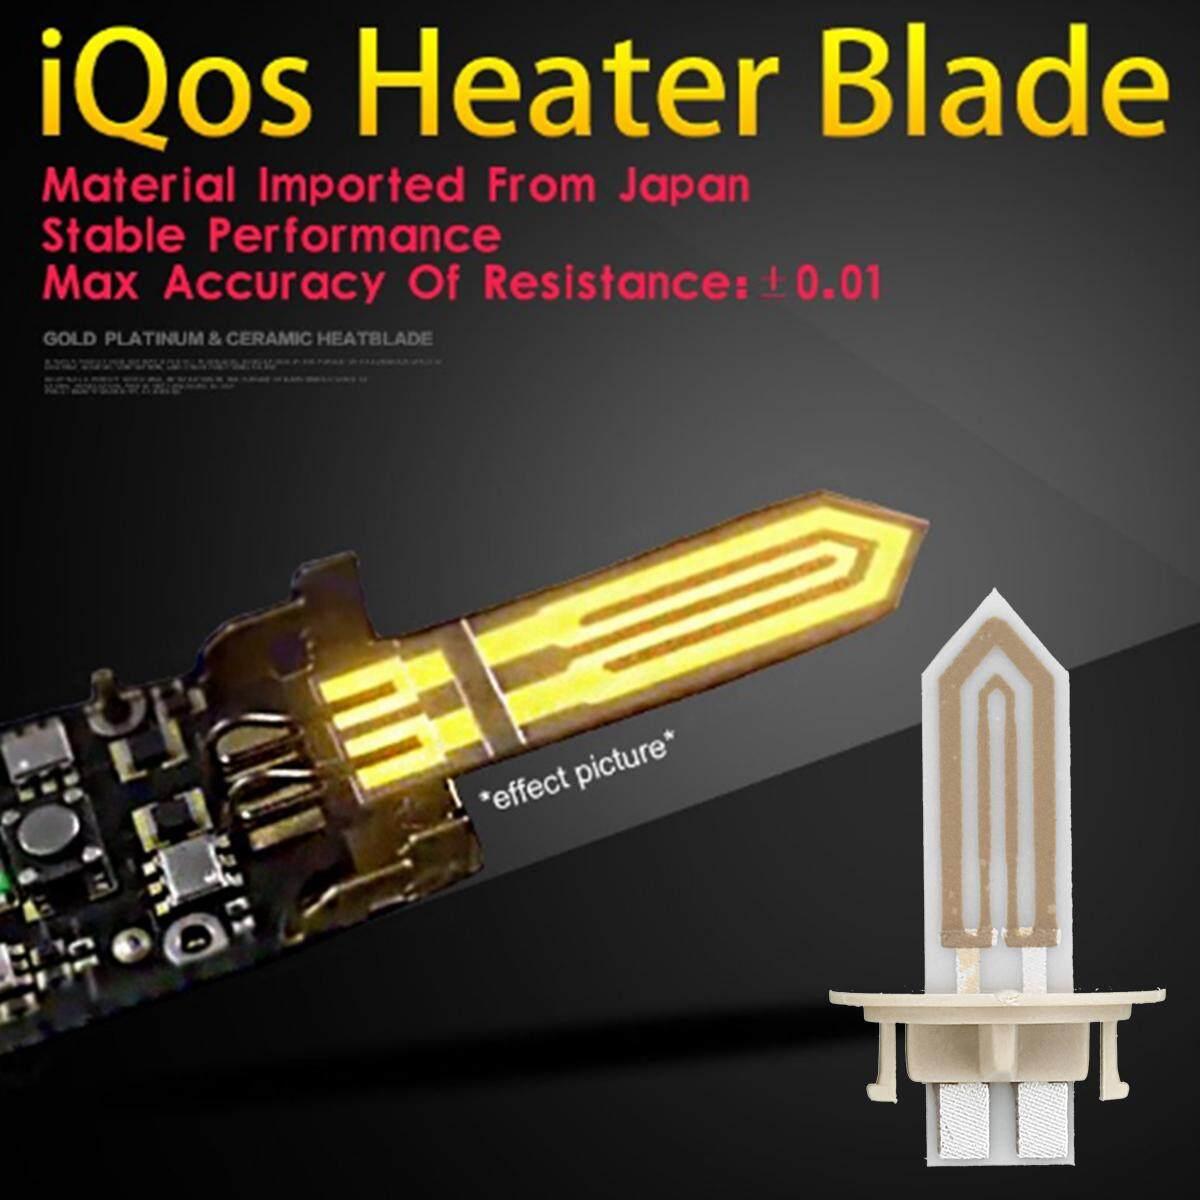 Replacement Ceramic Heater Blade For IQOS2.4 IQOS2.4 Plus Zirconia Heating Stick